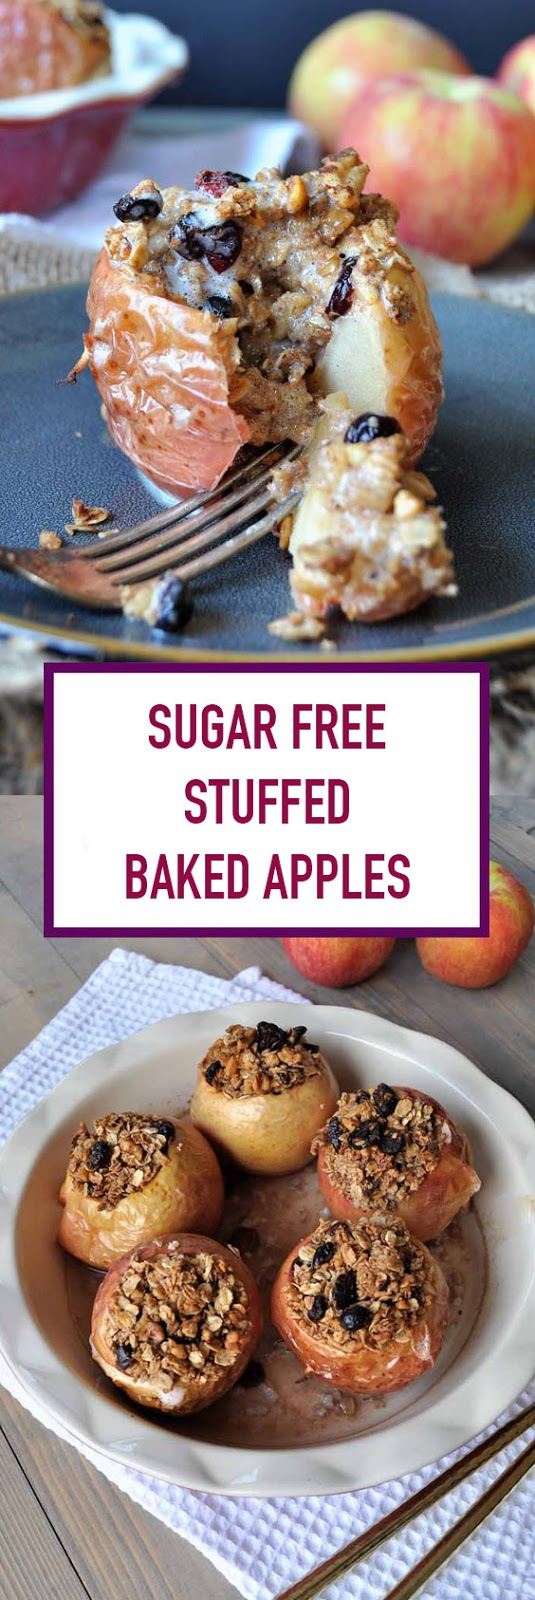 Sugar Free Stuffed Baked Apples